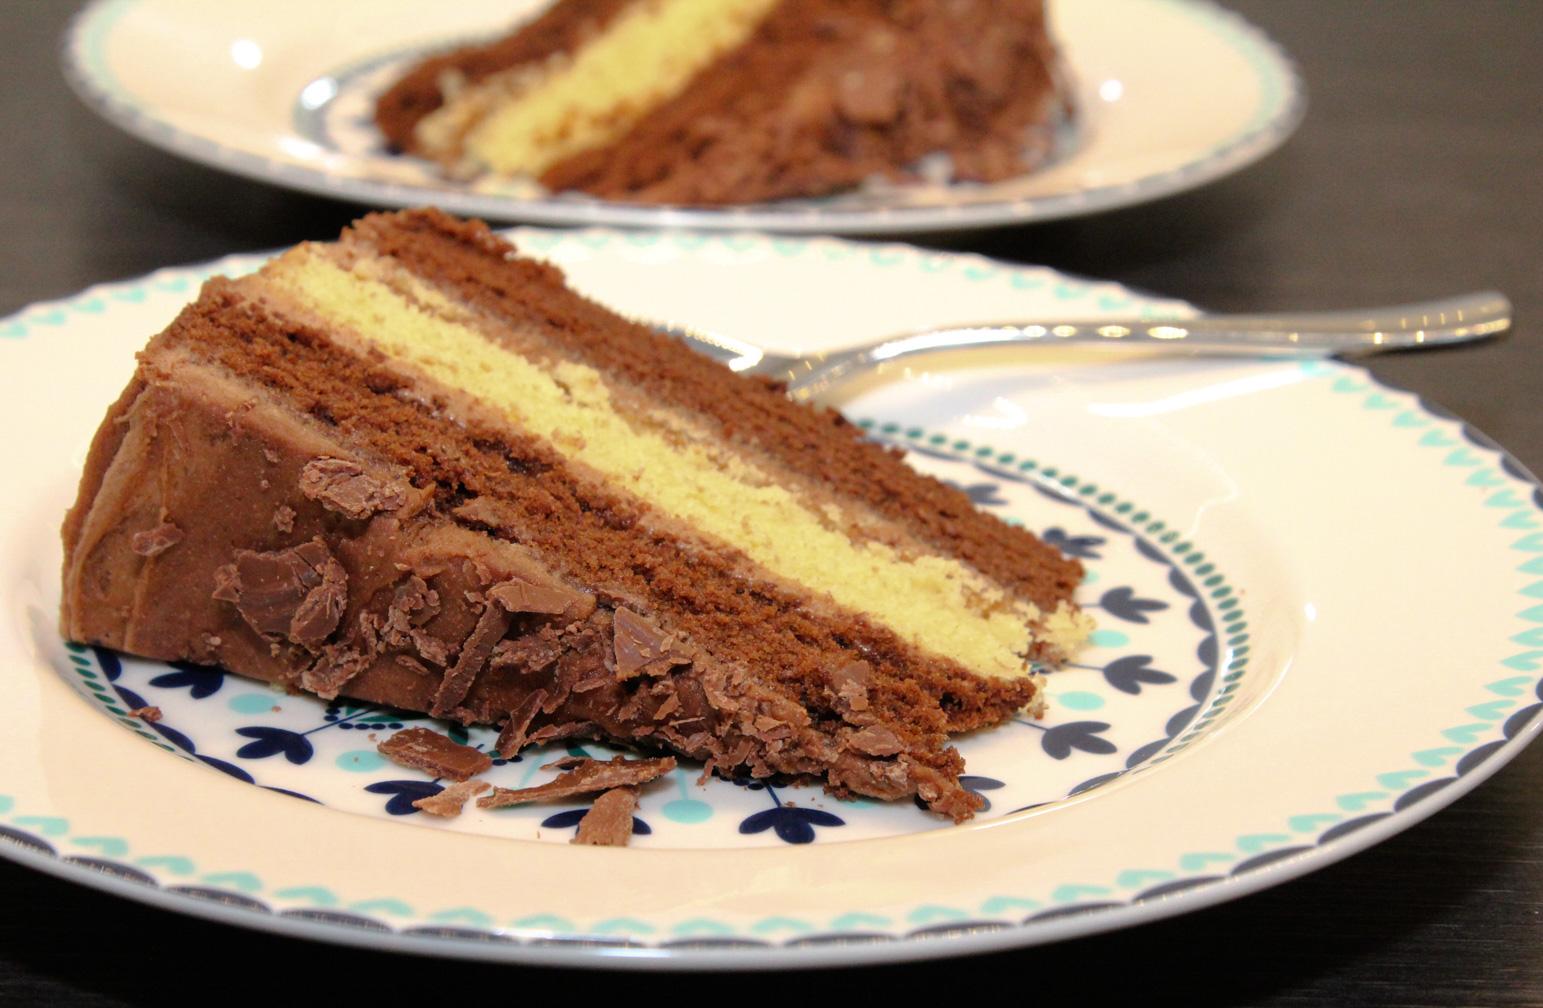 Thermomix Chocolate Sponge Cake